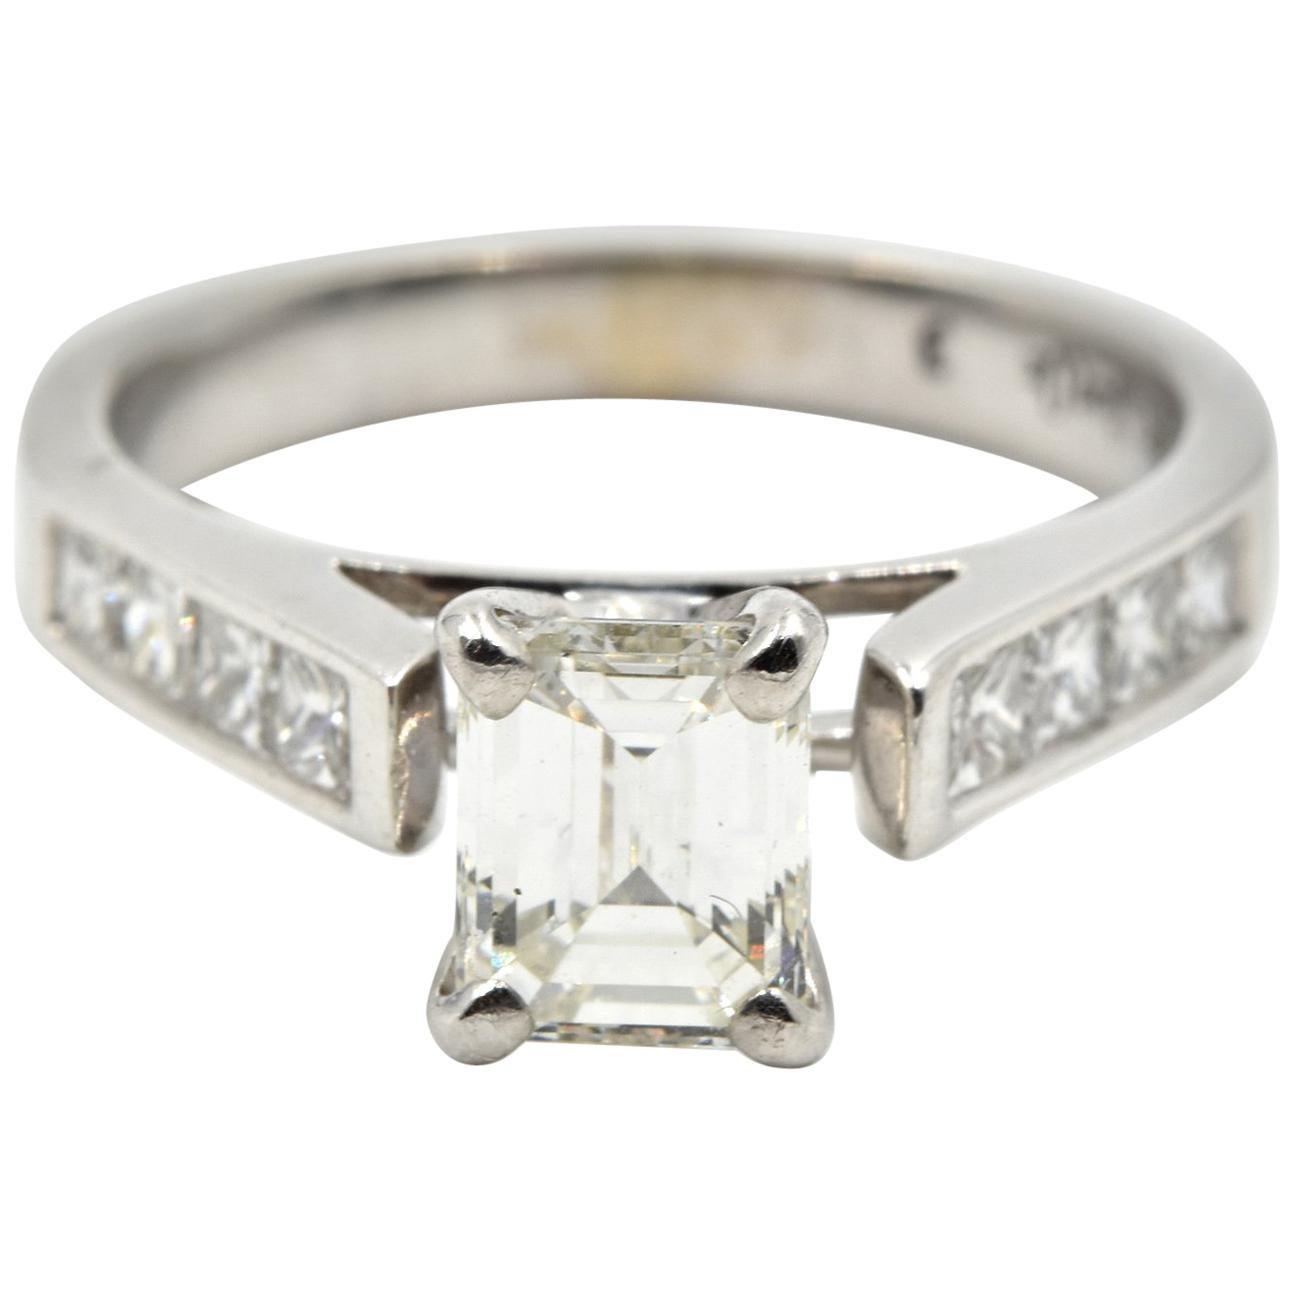 14 Karat White Gold 0.95 Carat Emerald Cut Centre Diamond Wedding Set